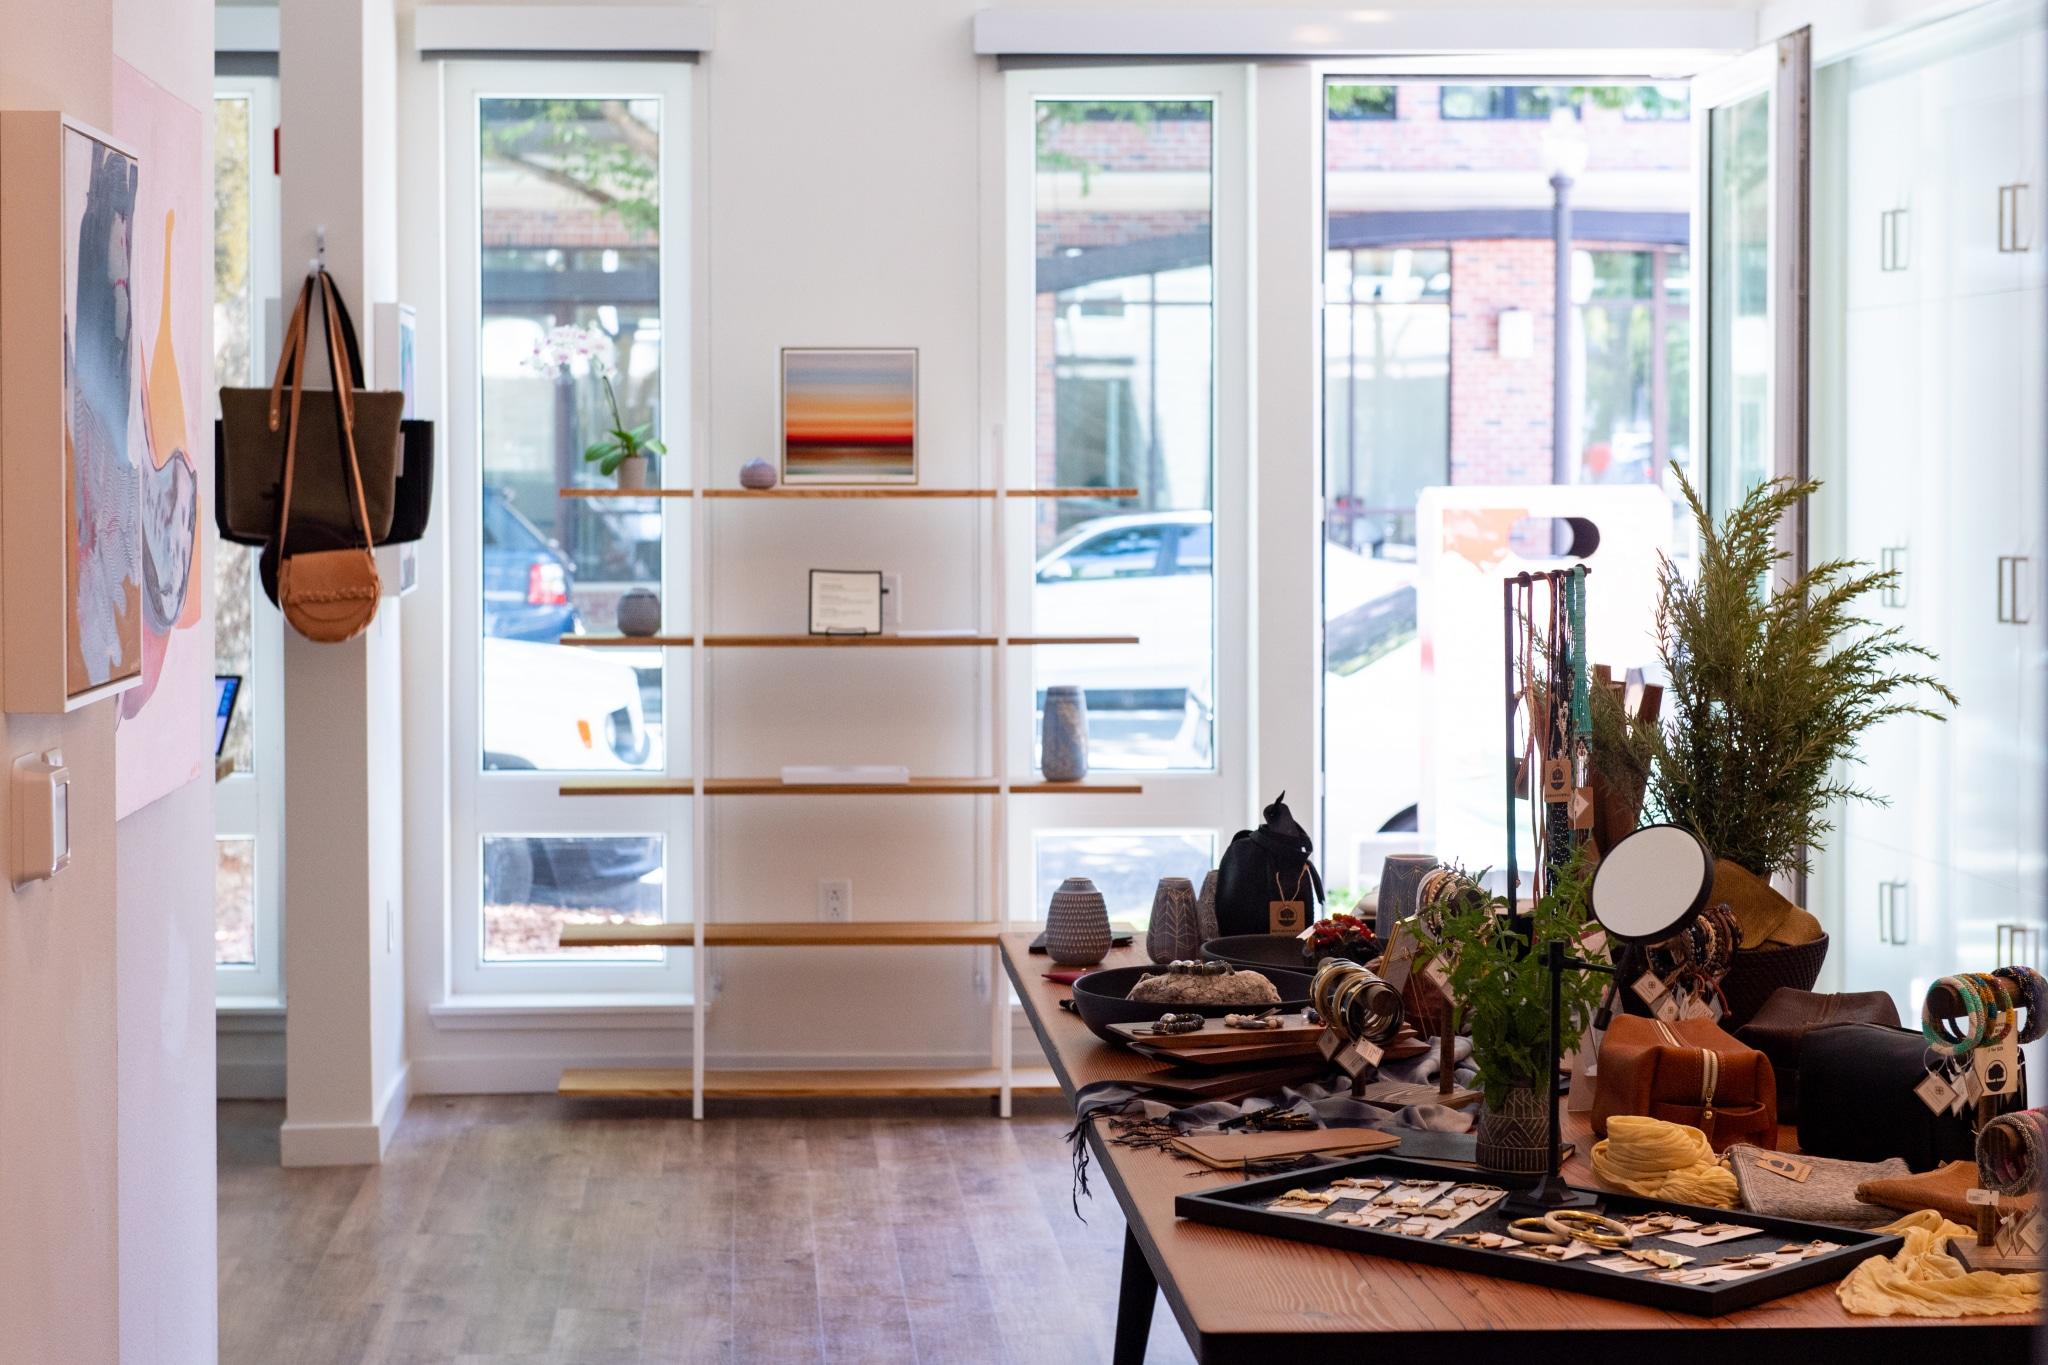 Groundswell Art Pop-Up Gallery at Midtown's H16 Apartments via @sacramentopress